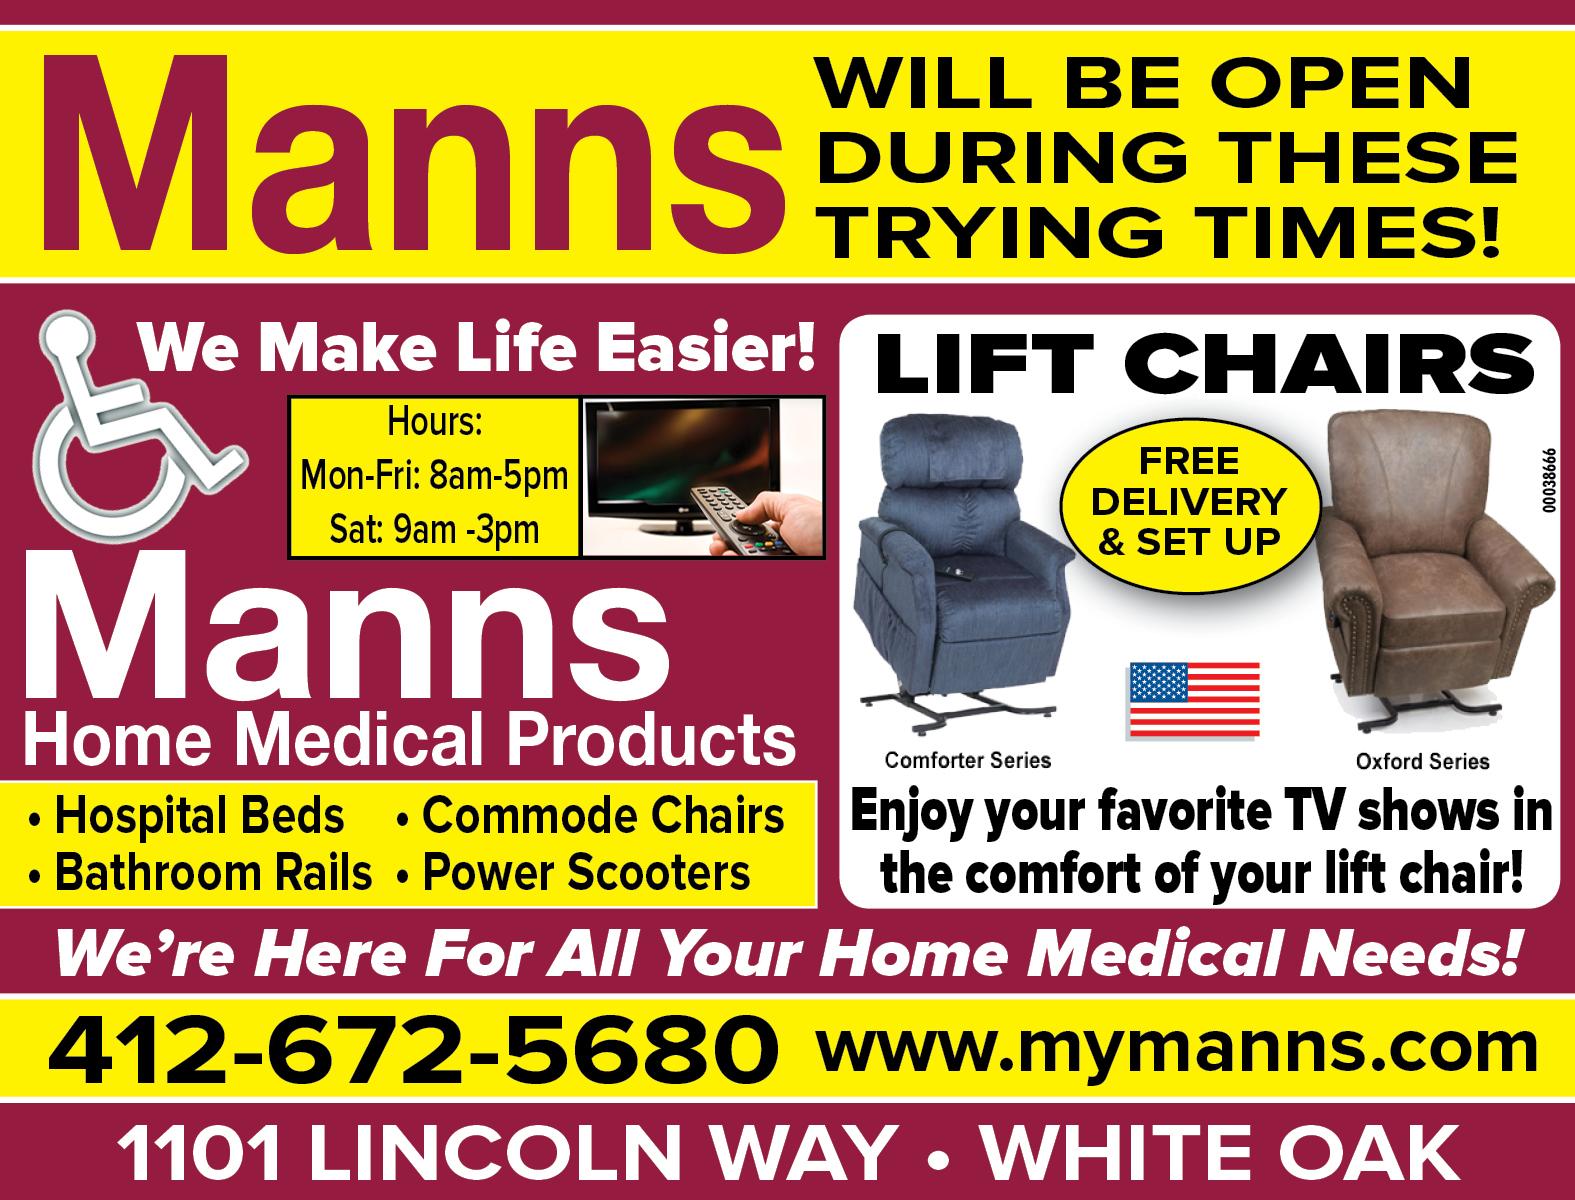 00038665_Manns_3x4_Lift Chair